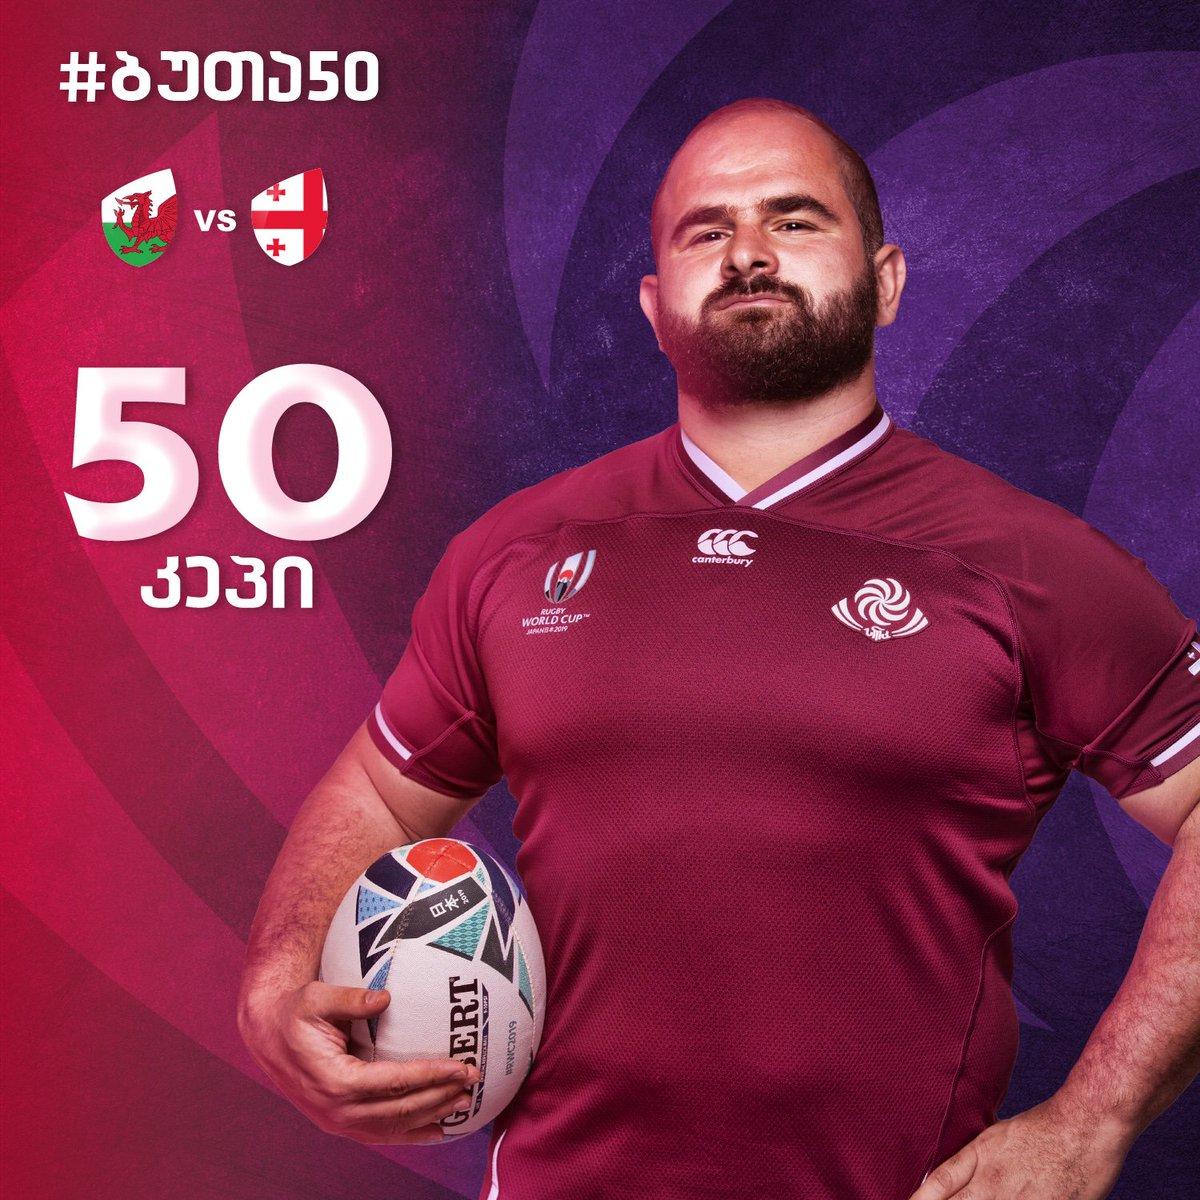 CAP UPDATE | #TheLelos Tight-head prop Levan Chilachava to win his 50th international cap for #Georgia against @WelshRugbyUnion in Georgias #RWC2019 opener on Monday in #RWCCityOfToyota #WALvGEO #ბუთა50 #რაგბიჩვენითამაშია